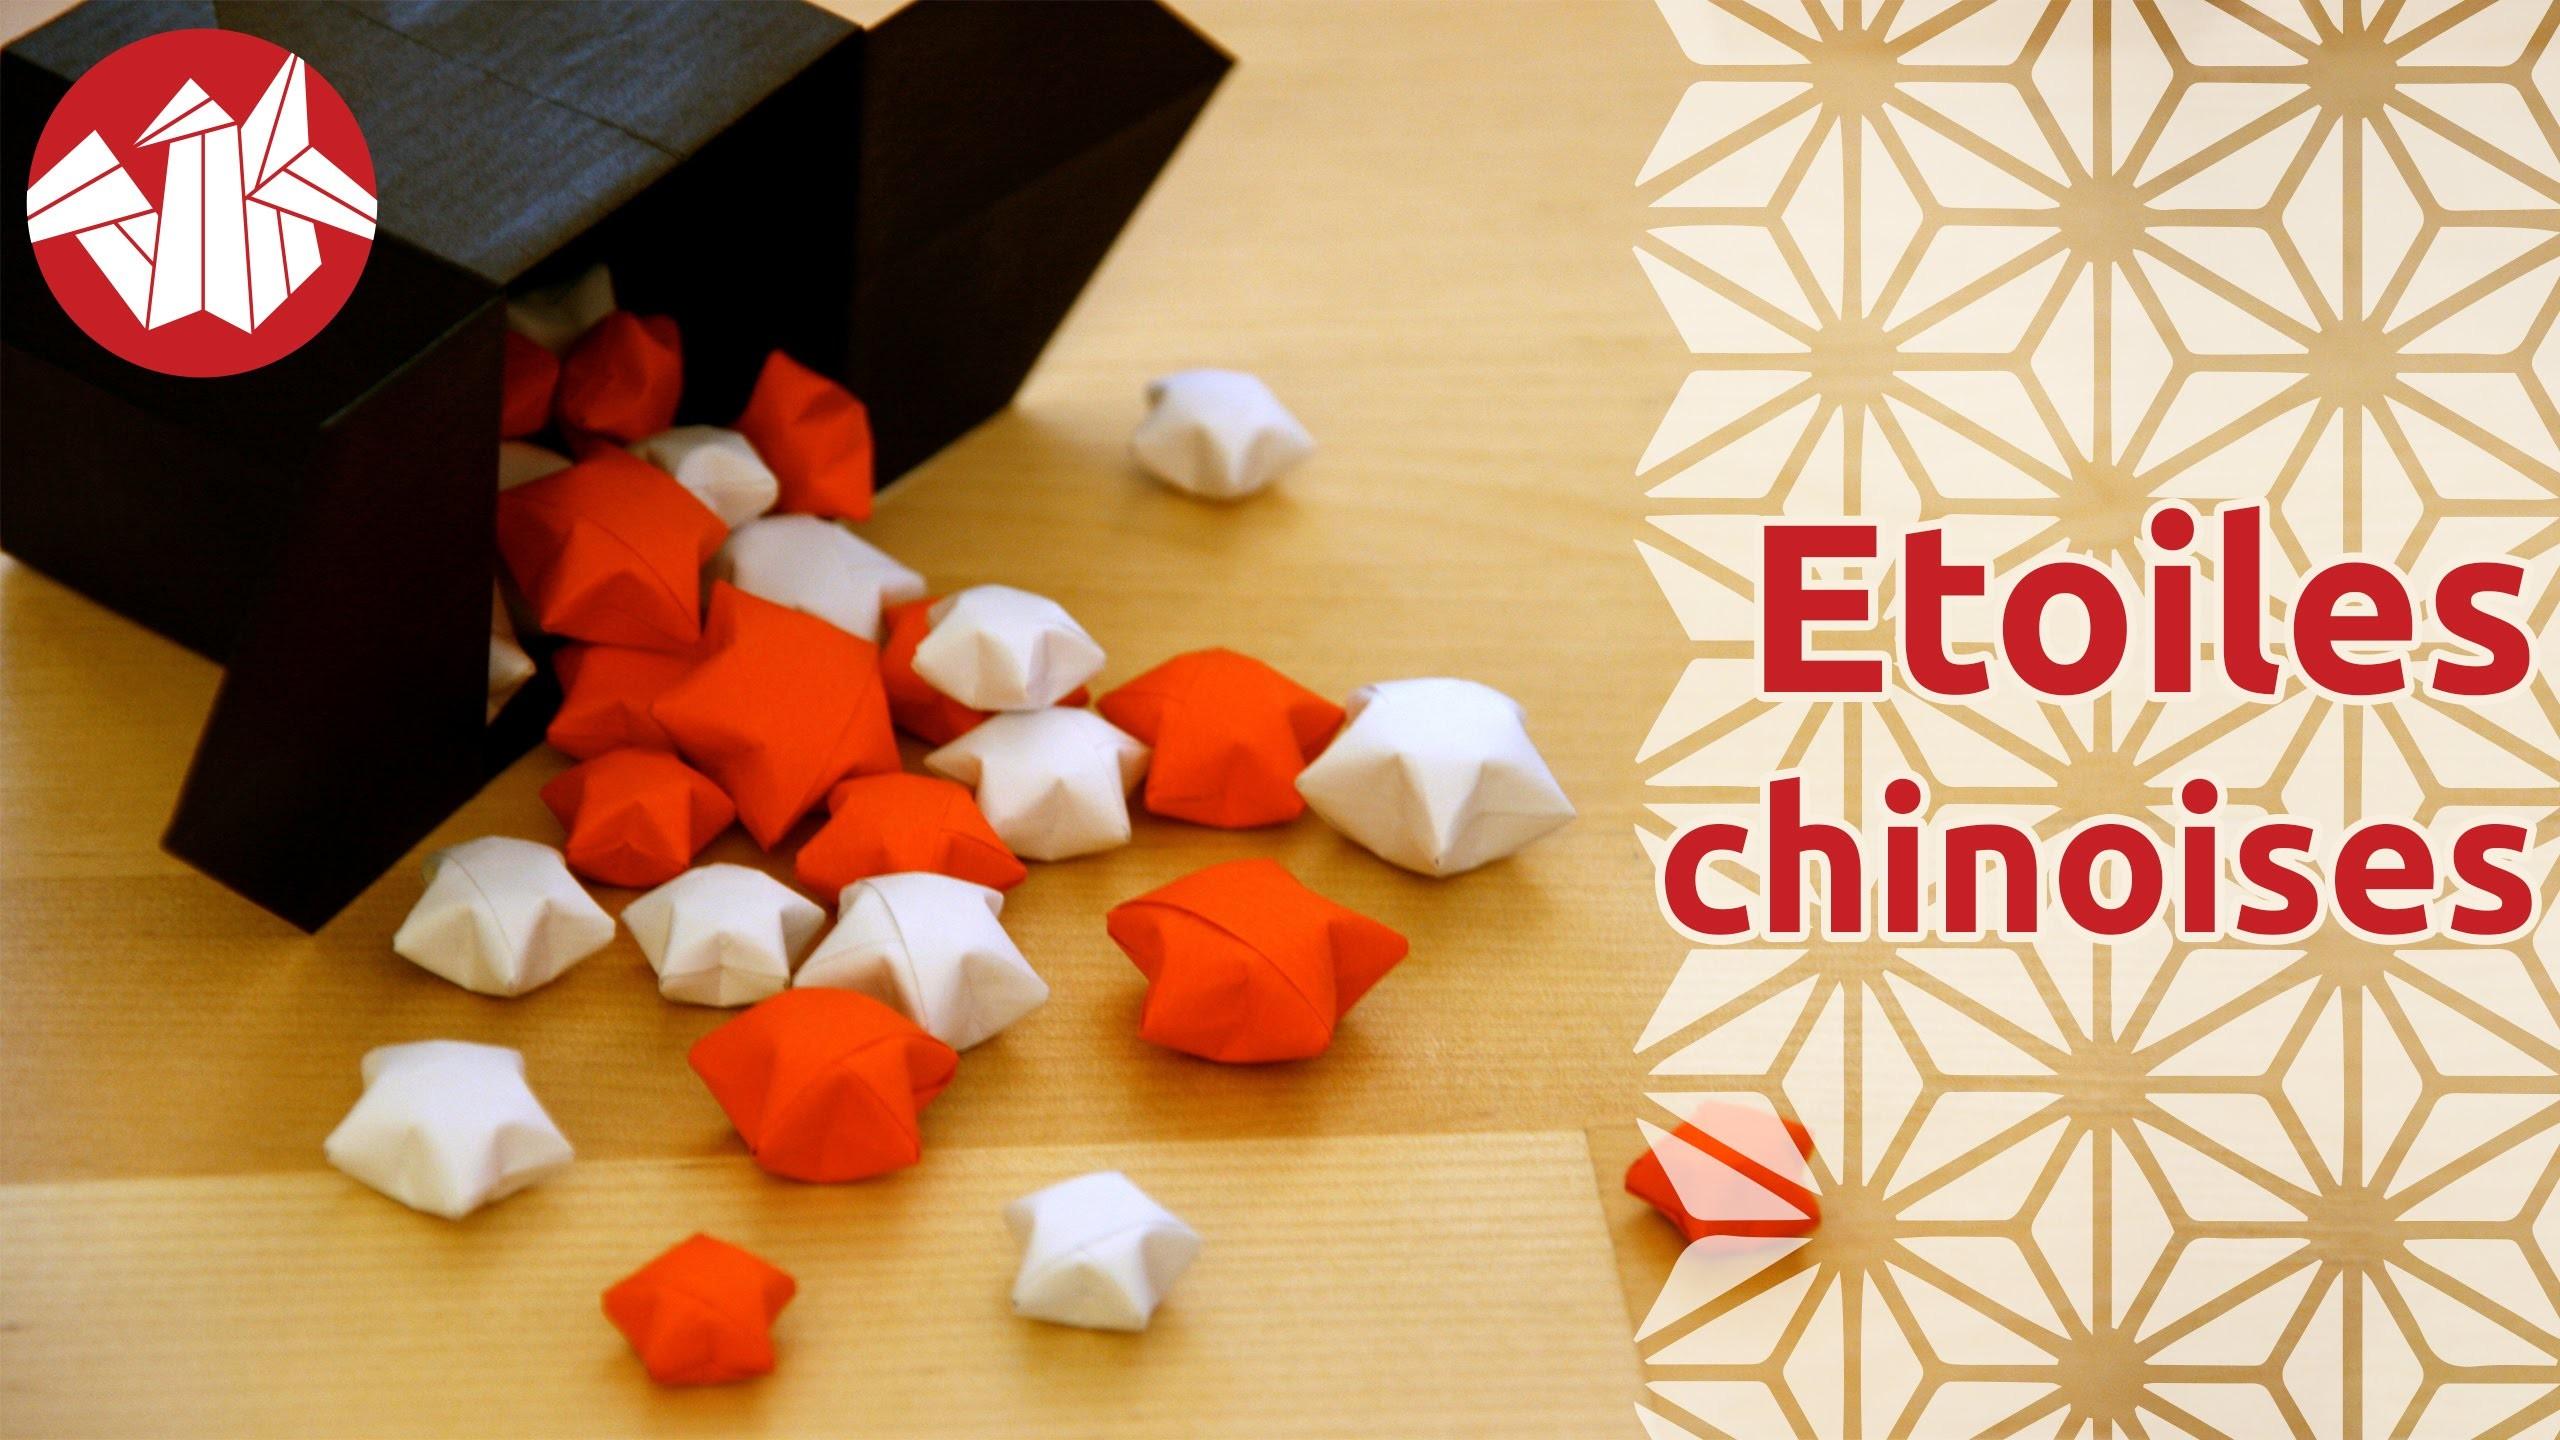 origami etoiles chinoises du bonheur senbazuru. Black Bedroom Furniture Sets. Home Design Ideas